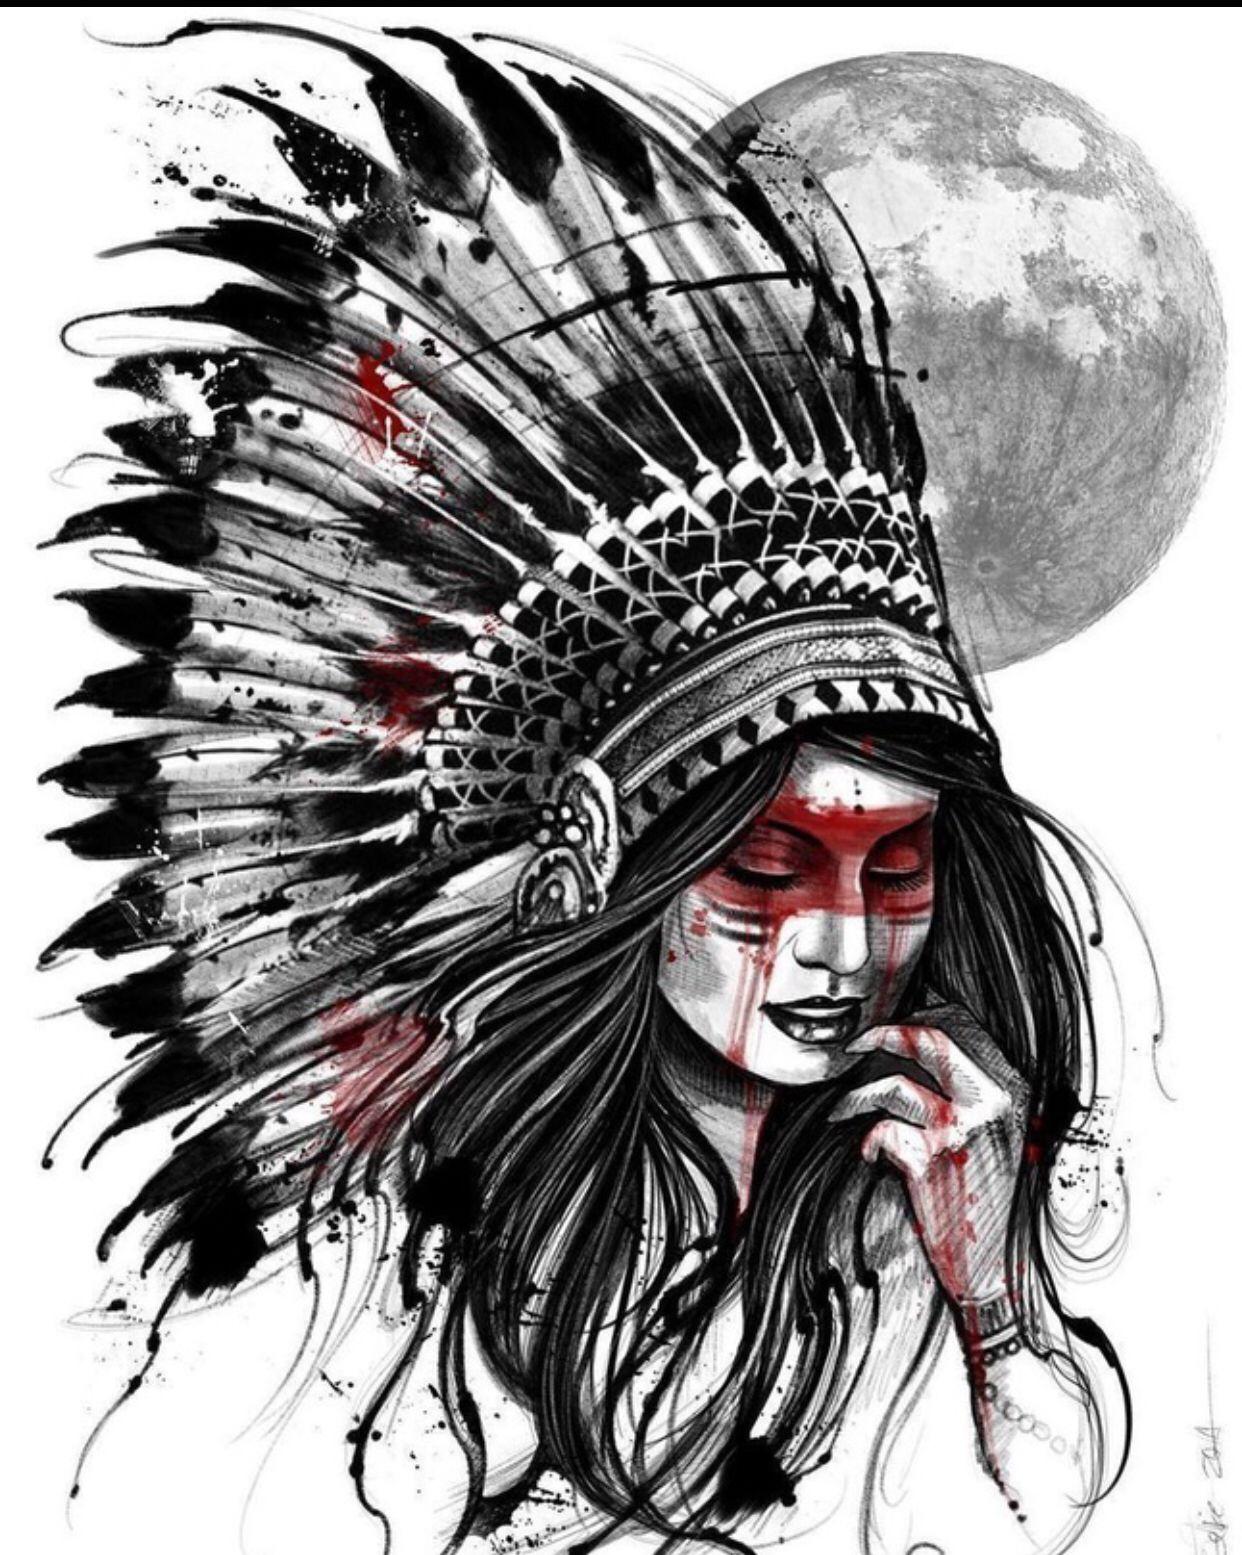 Pin De Bliznec Em Tatu Tatuagens Indigenas Americanas Tatuagens